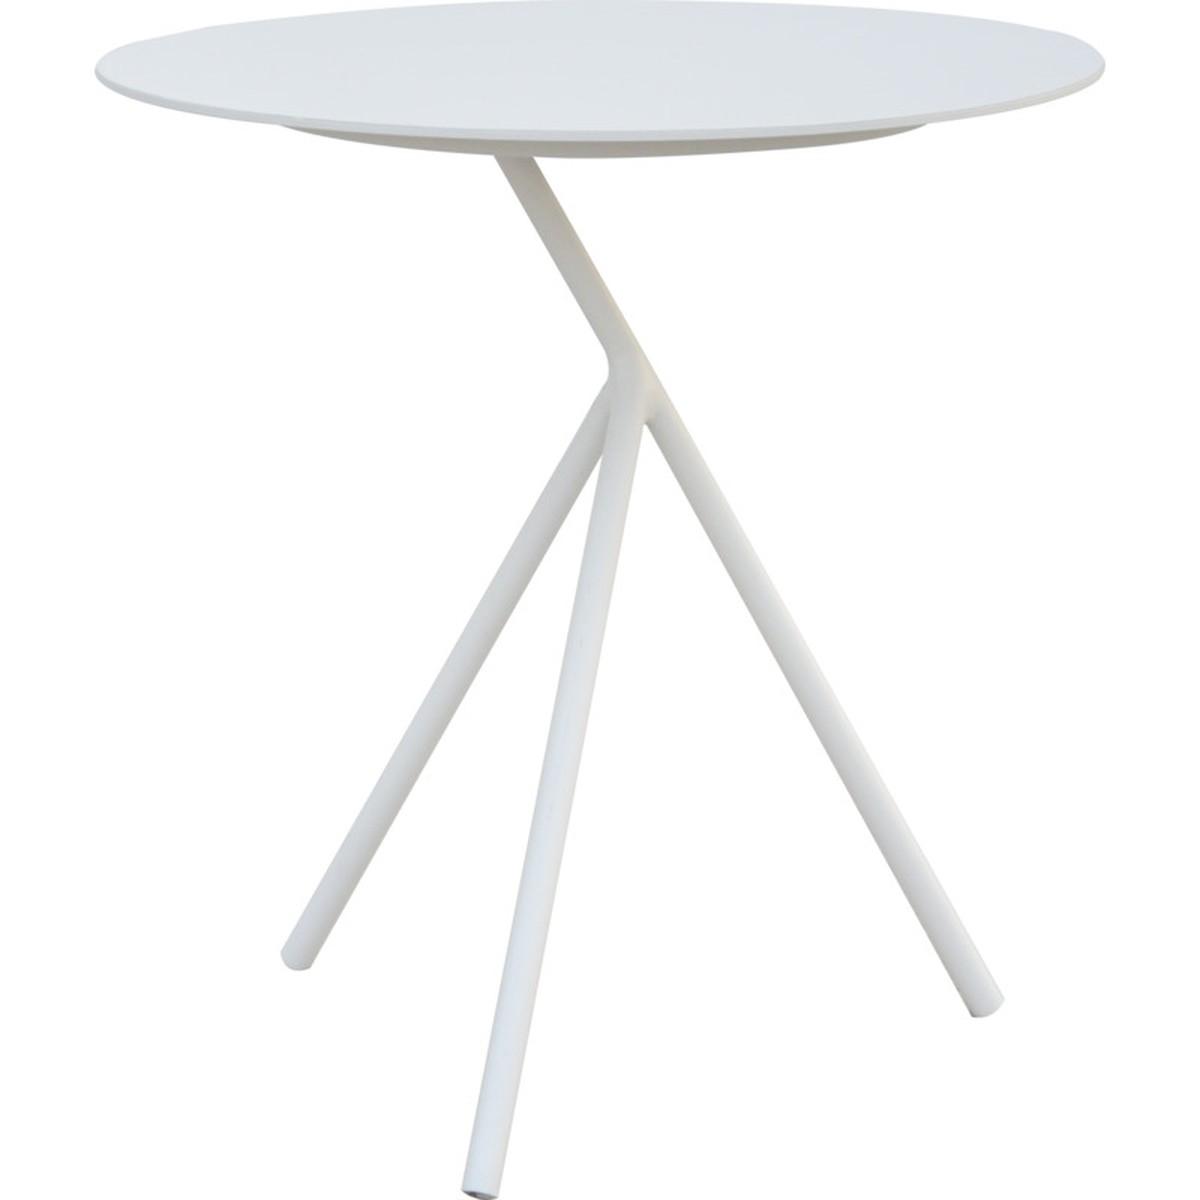 schilliger design table d appoint abo haute blanc 52x52. Black Bedroom Furniture Sets. Home Design Ideas